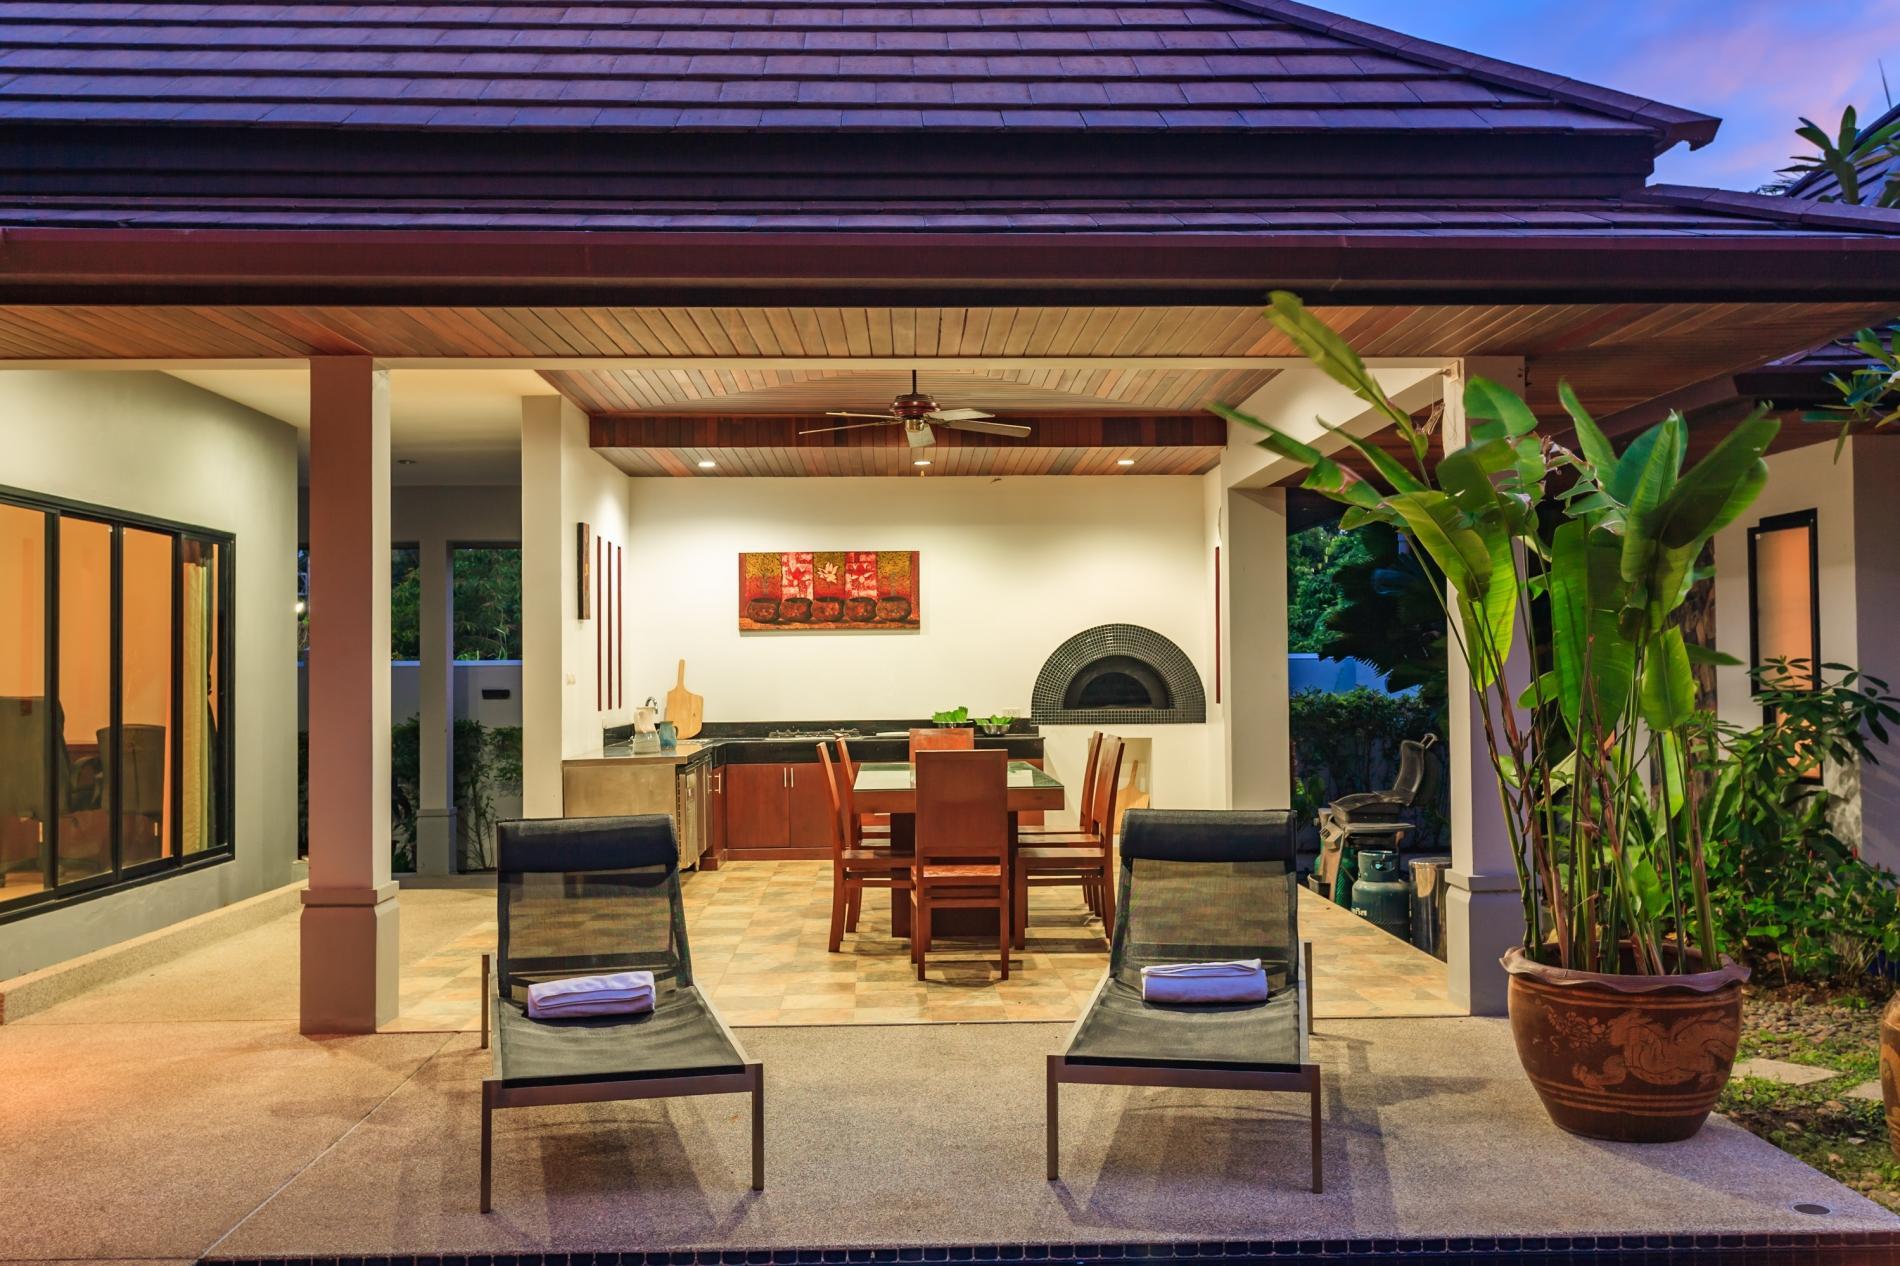 Frangipani Villa in Nai Harn - 5 bedroom private pool with garden and pizza oven photo 16031990